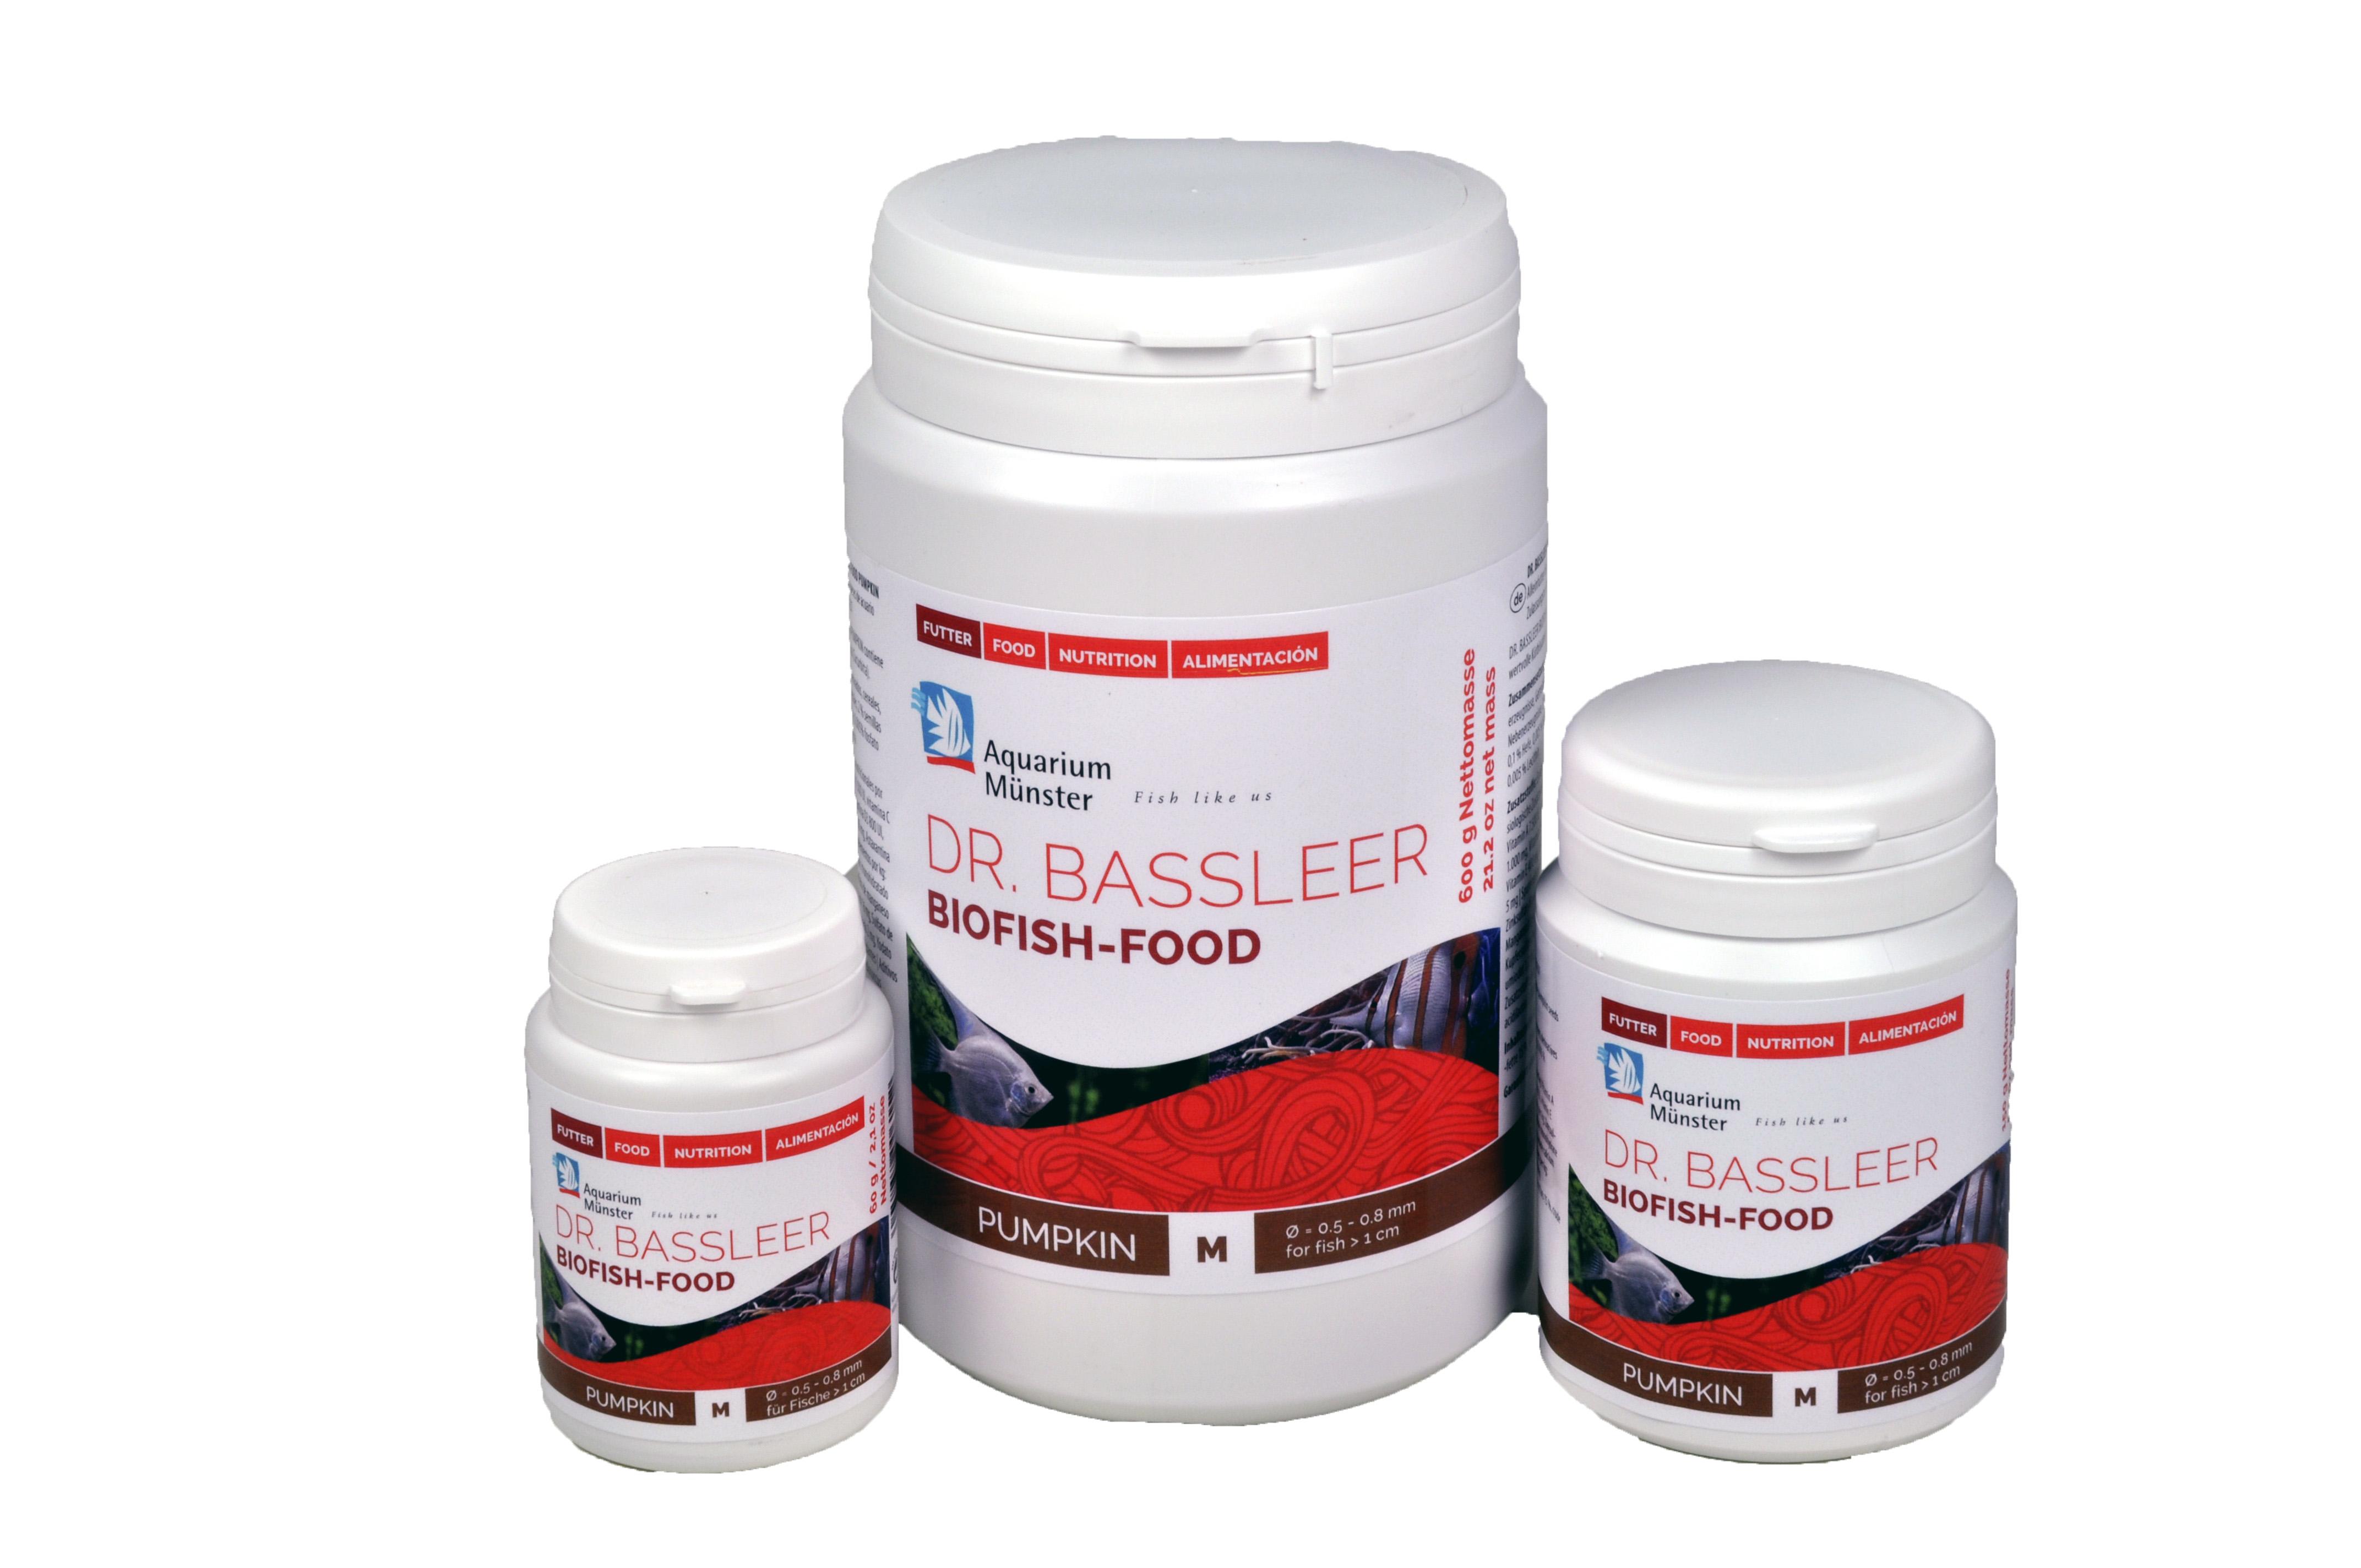 Dr Bassleer Biofish food Pumpkin